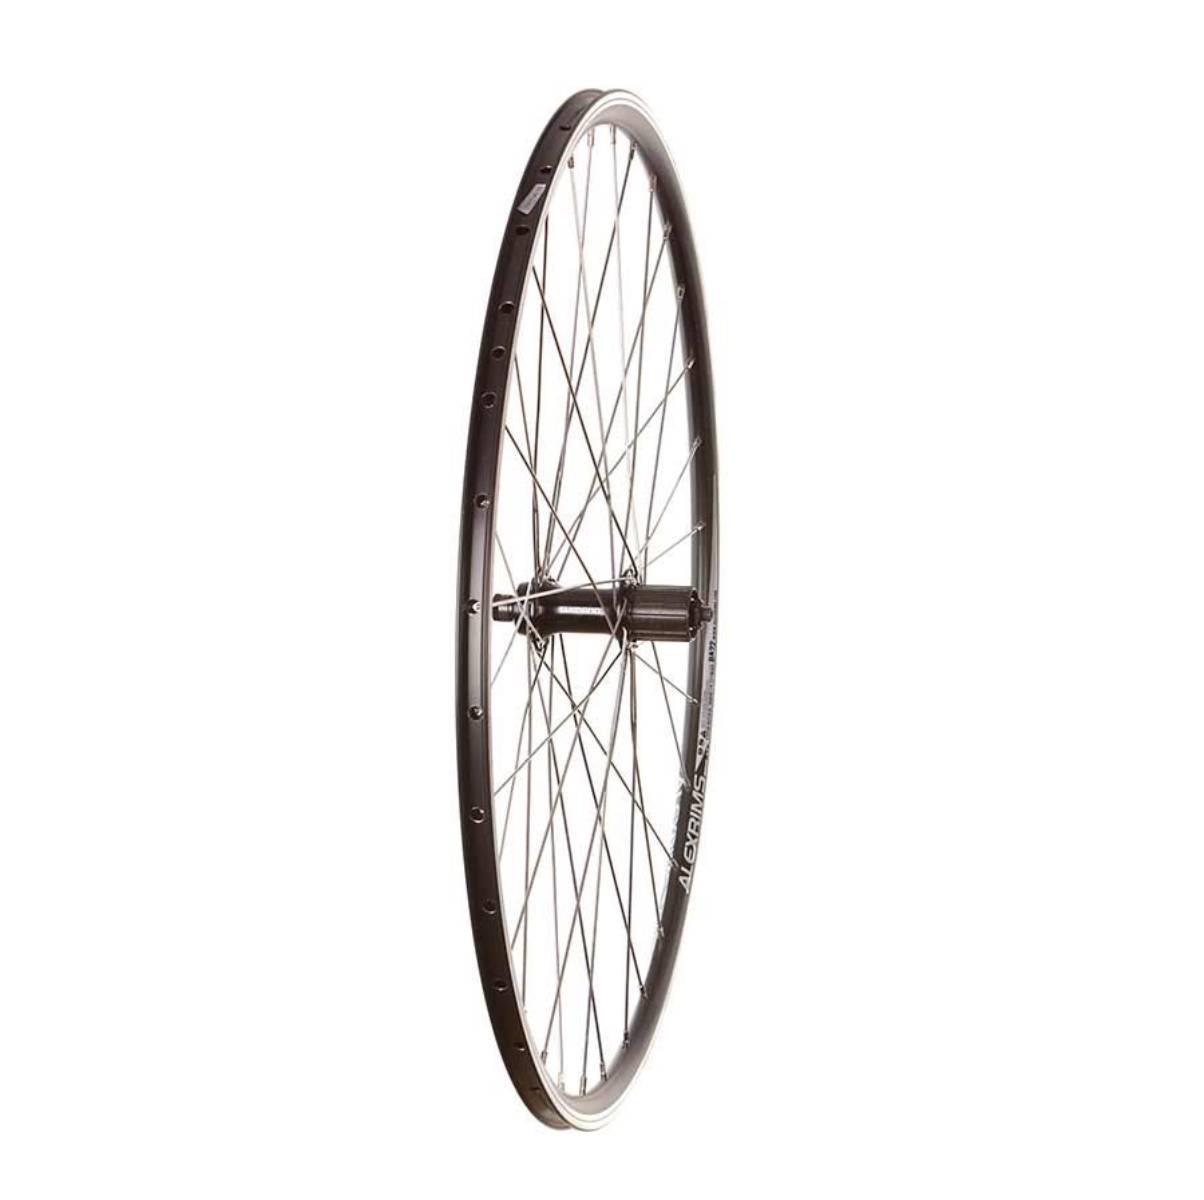 Wheel Shop, ROAD - 700C - ALEX DA22 BLACK/ STAINLESS SPOKES, Wheel, Rear, 700C, Sora FH-RS300, DA-22, Black, 32, Stainless, QR, 130mm, Shimano Road 10/ MTB 11, Rim, Double wall